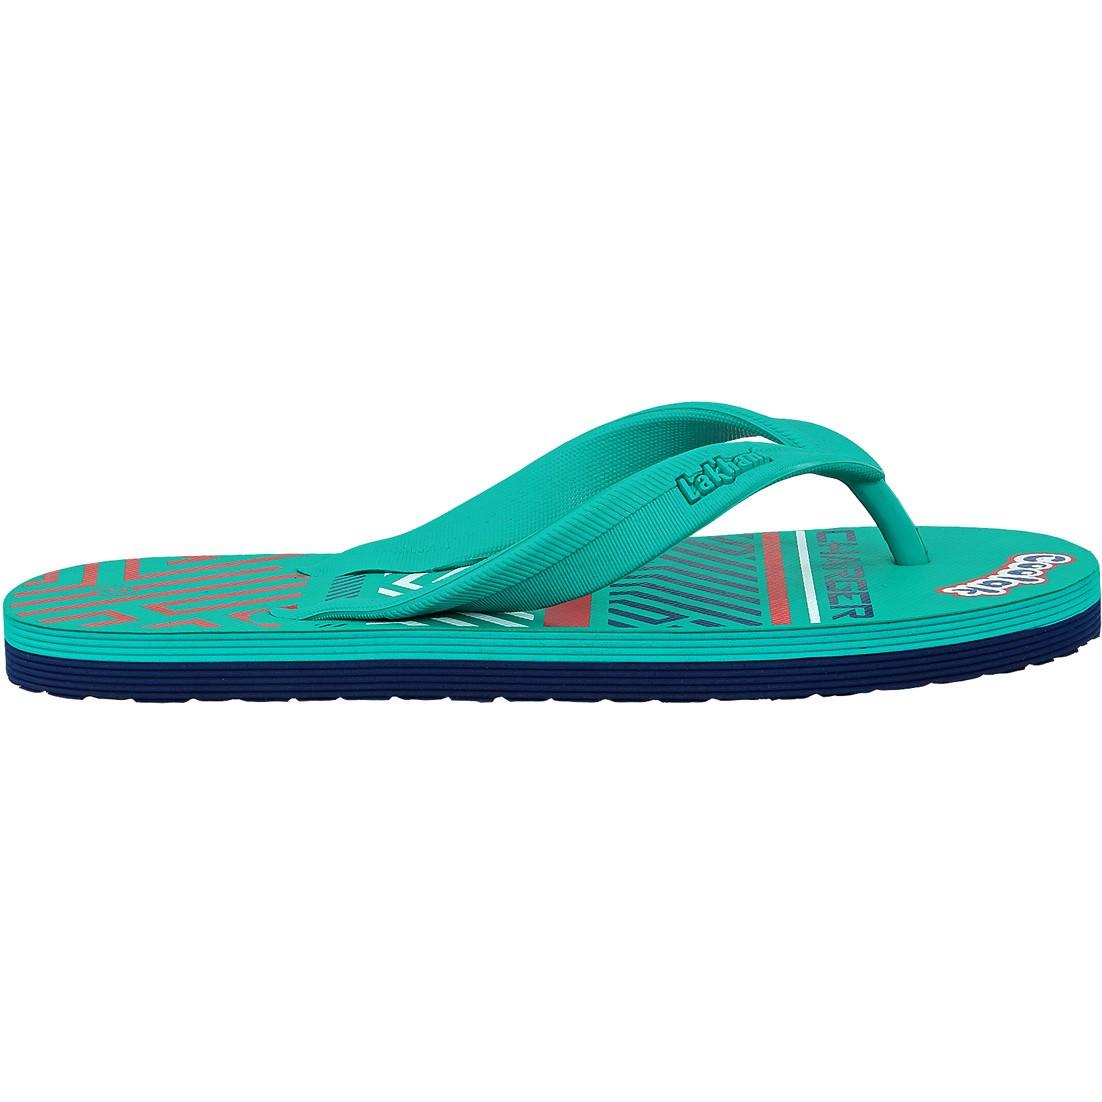 Coolak-1202-Sea Green/Blue